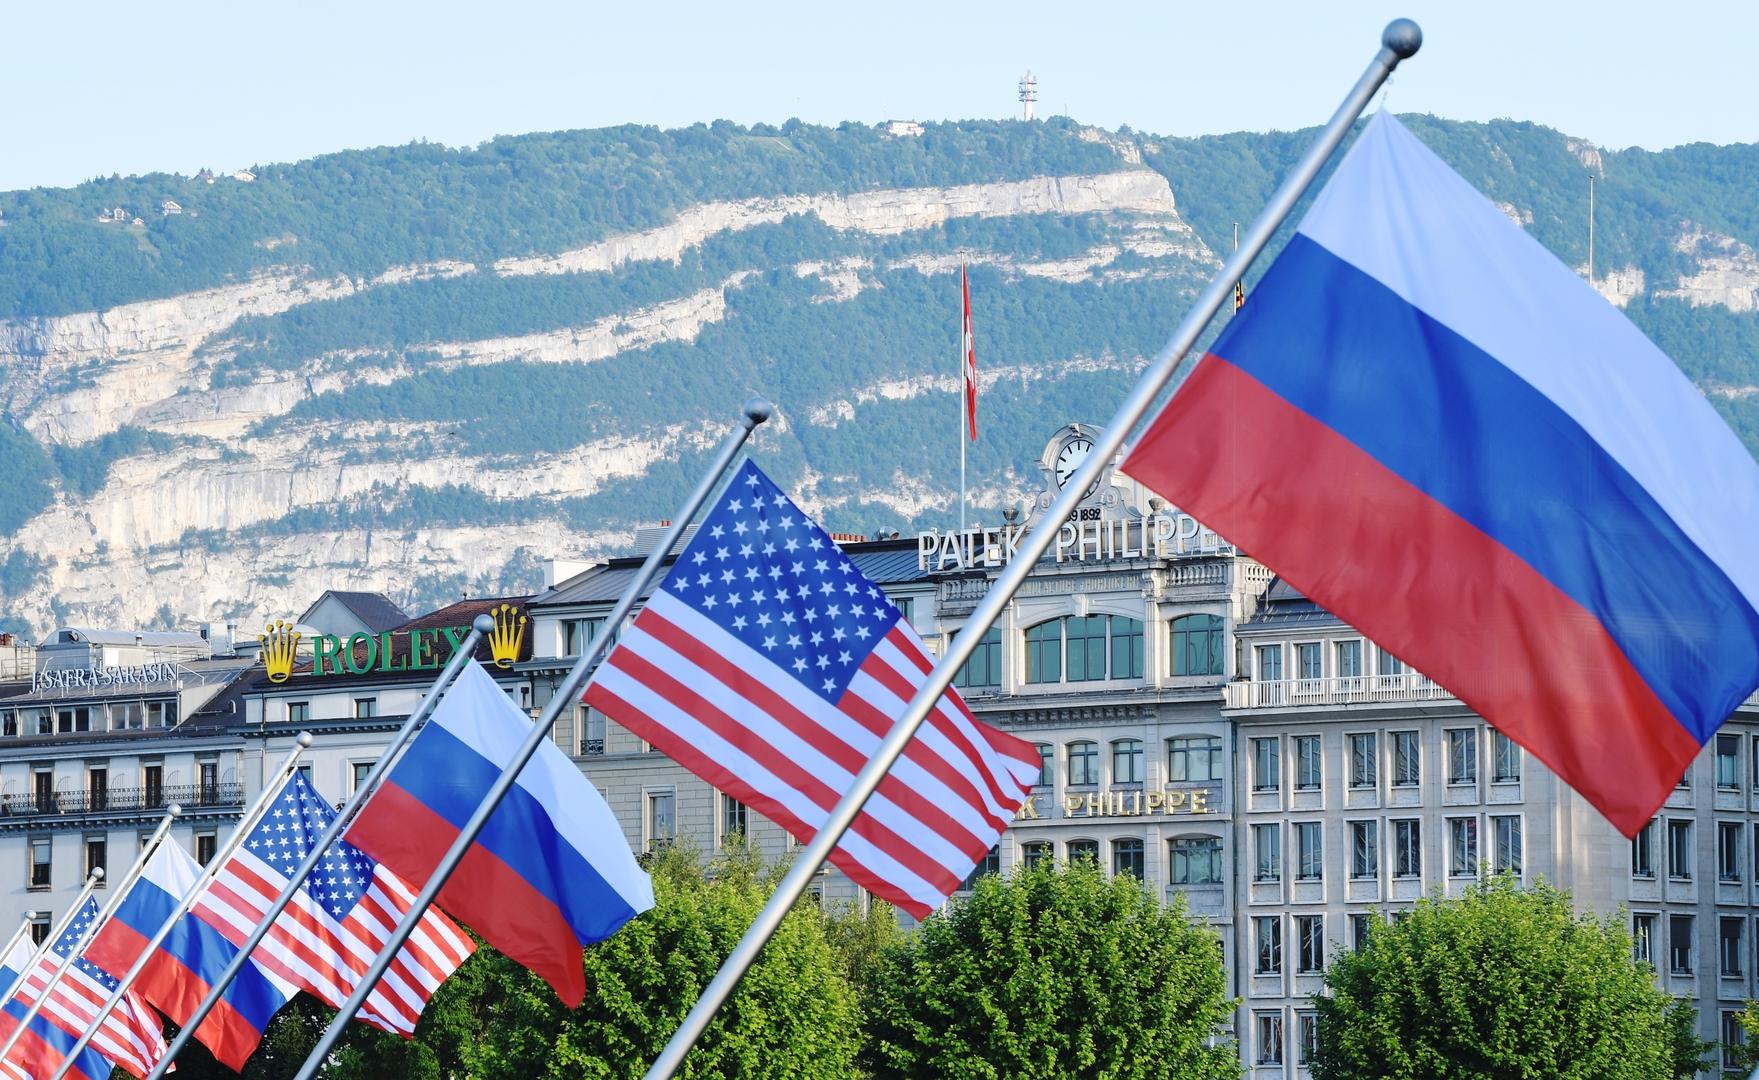 جنيف في انتظار قمة بوتين-بايدن